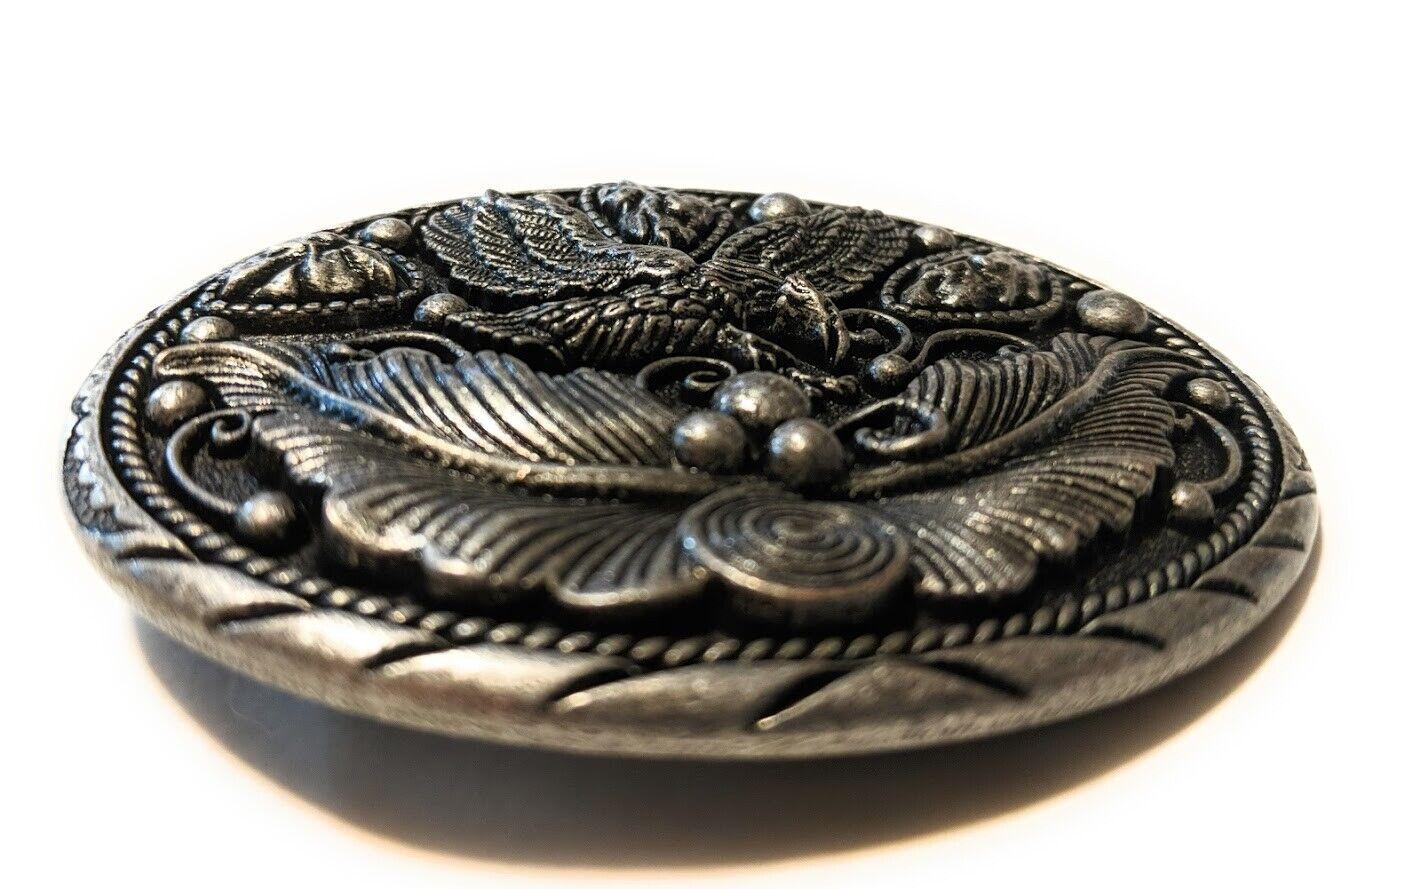 ✖ EAGLE SOARING Belt buckle Pewter color beauty solid USA mens 3.5 inch Hunter